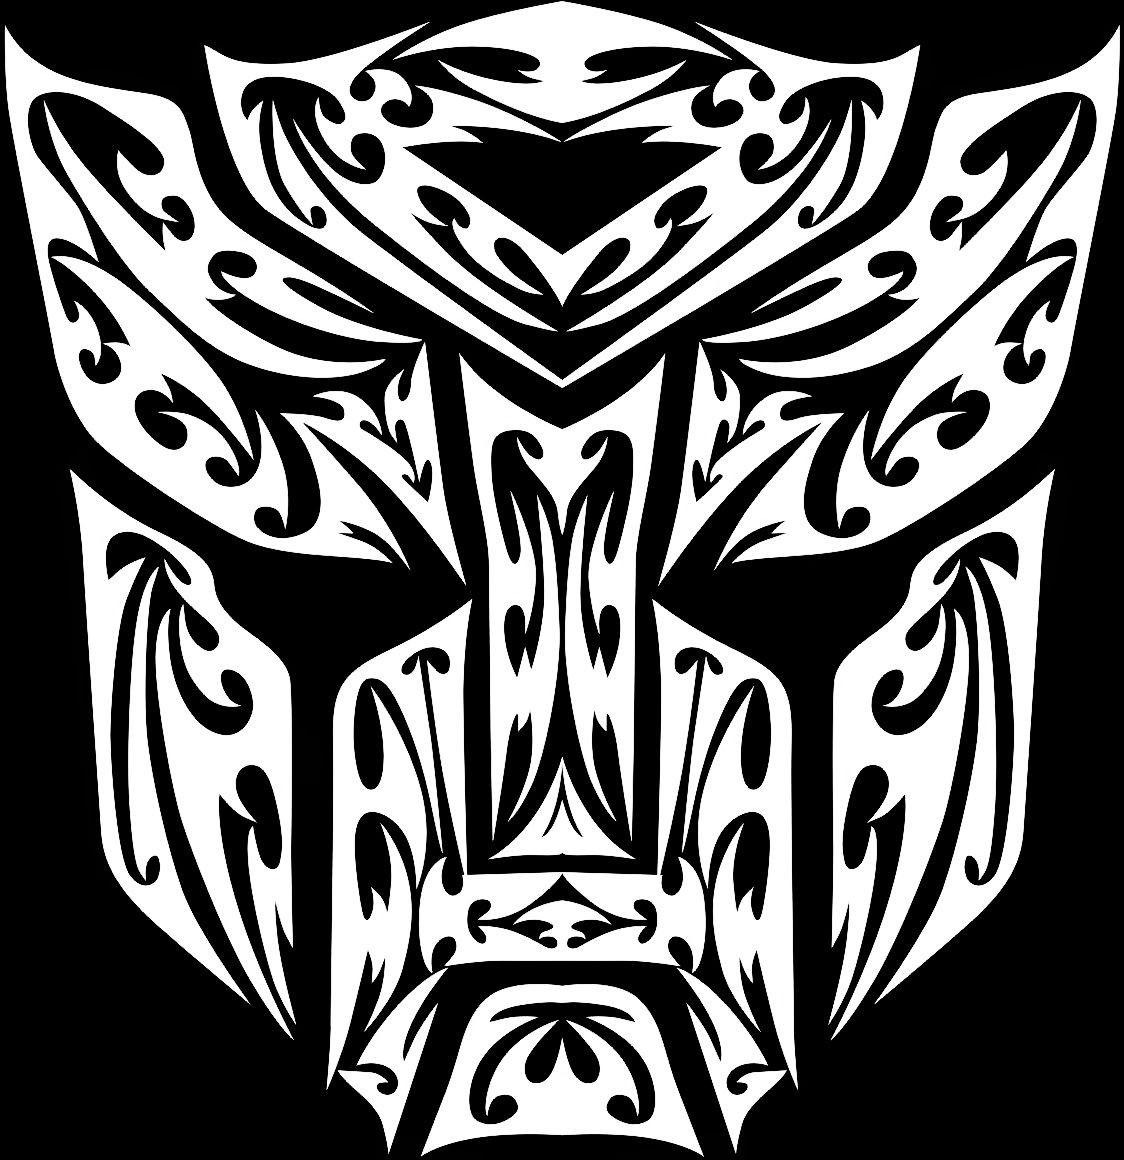 Amaterasu Papercraft Transformers Bumblebee Autobot Logo